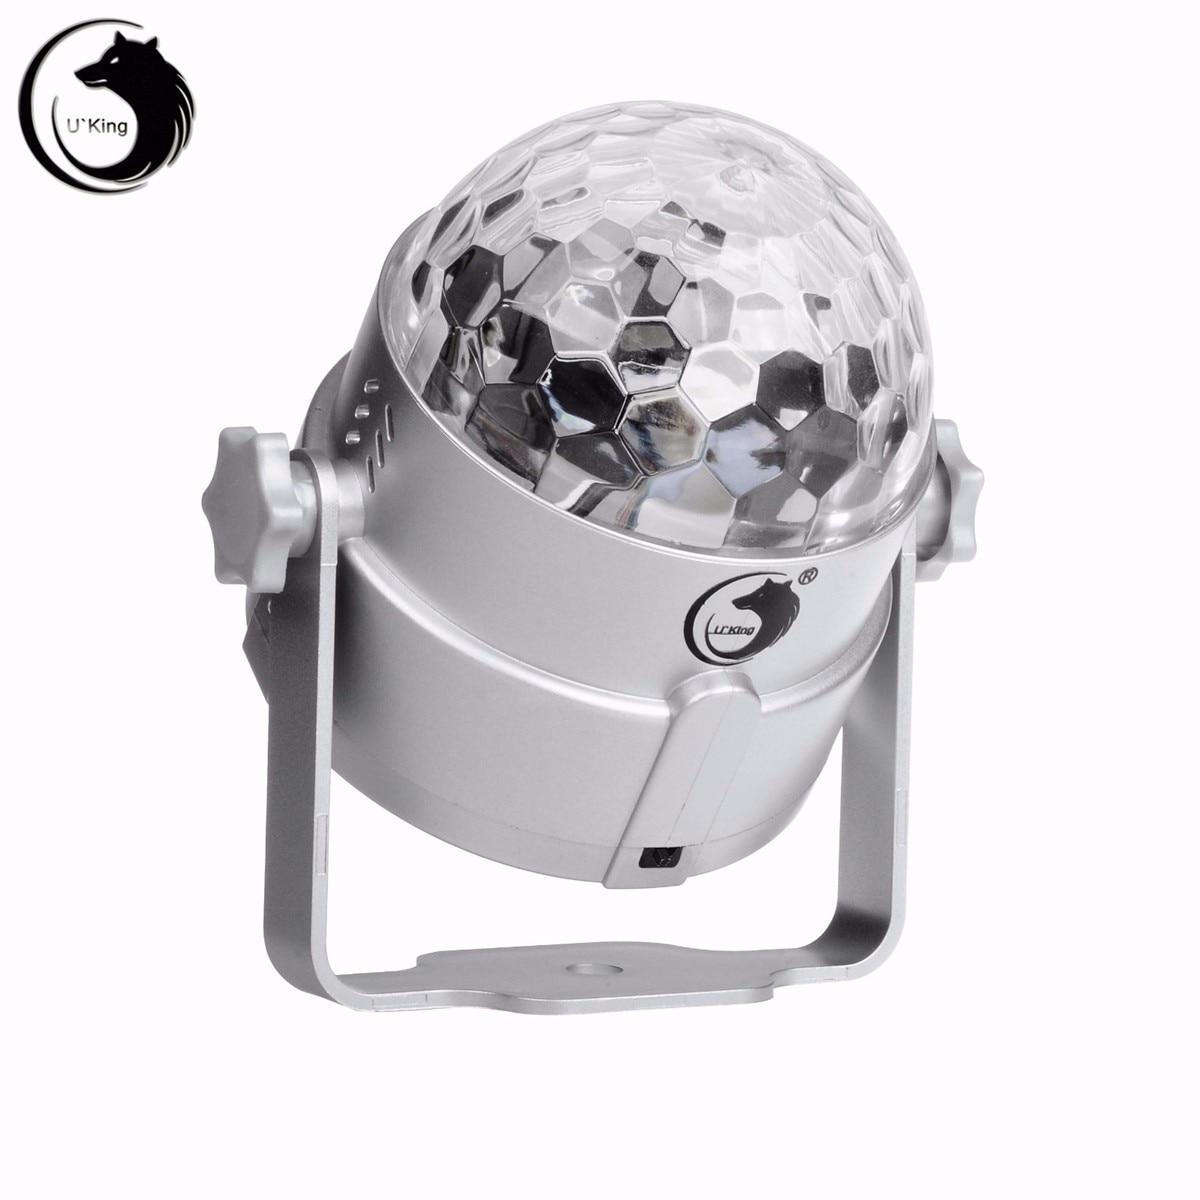 Voice Control Auto 3 Color LED Magic Stage Light Crystal Ball Night Lamp Hanging Club Pub Bar Disco Wedding Party Show Lighting novelty glass magic plasma ball light 3